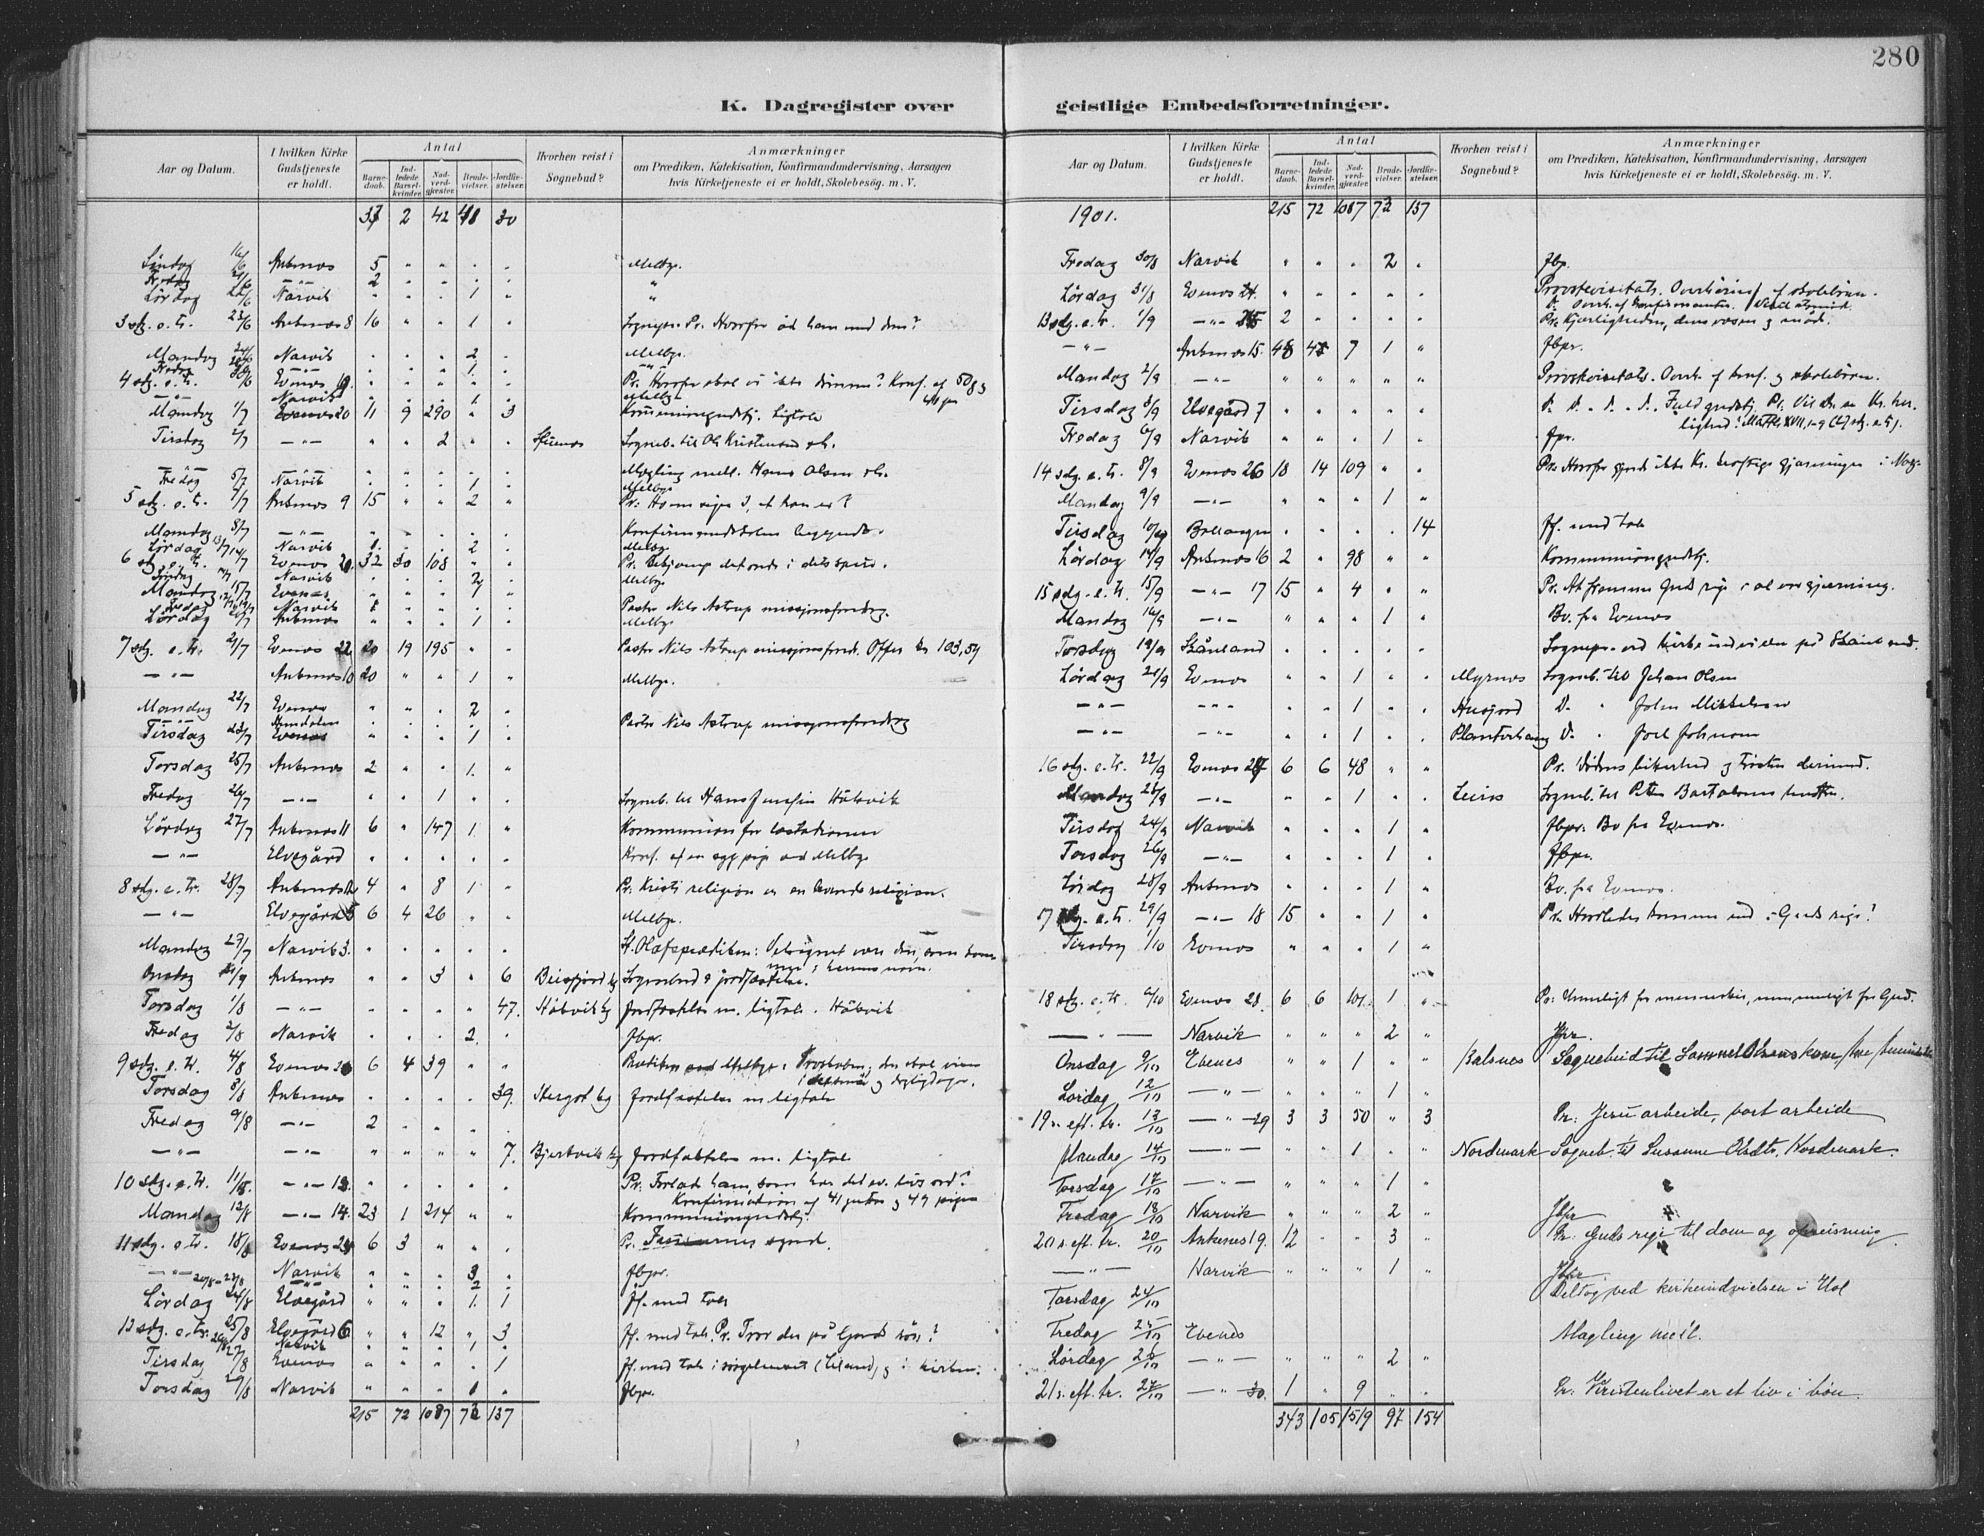 SAT, Ministerialprotokoller, klokkerbøker og fødselsregistre - Nordland, 863/L0899: Ministerialbok nr. 863A11, 1897-1906, s. 280